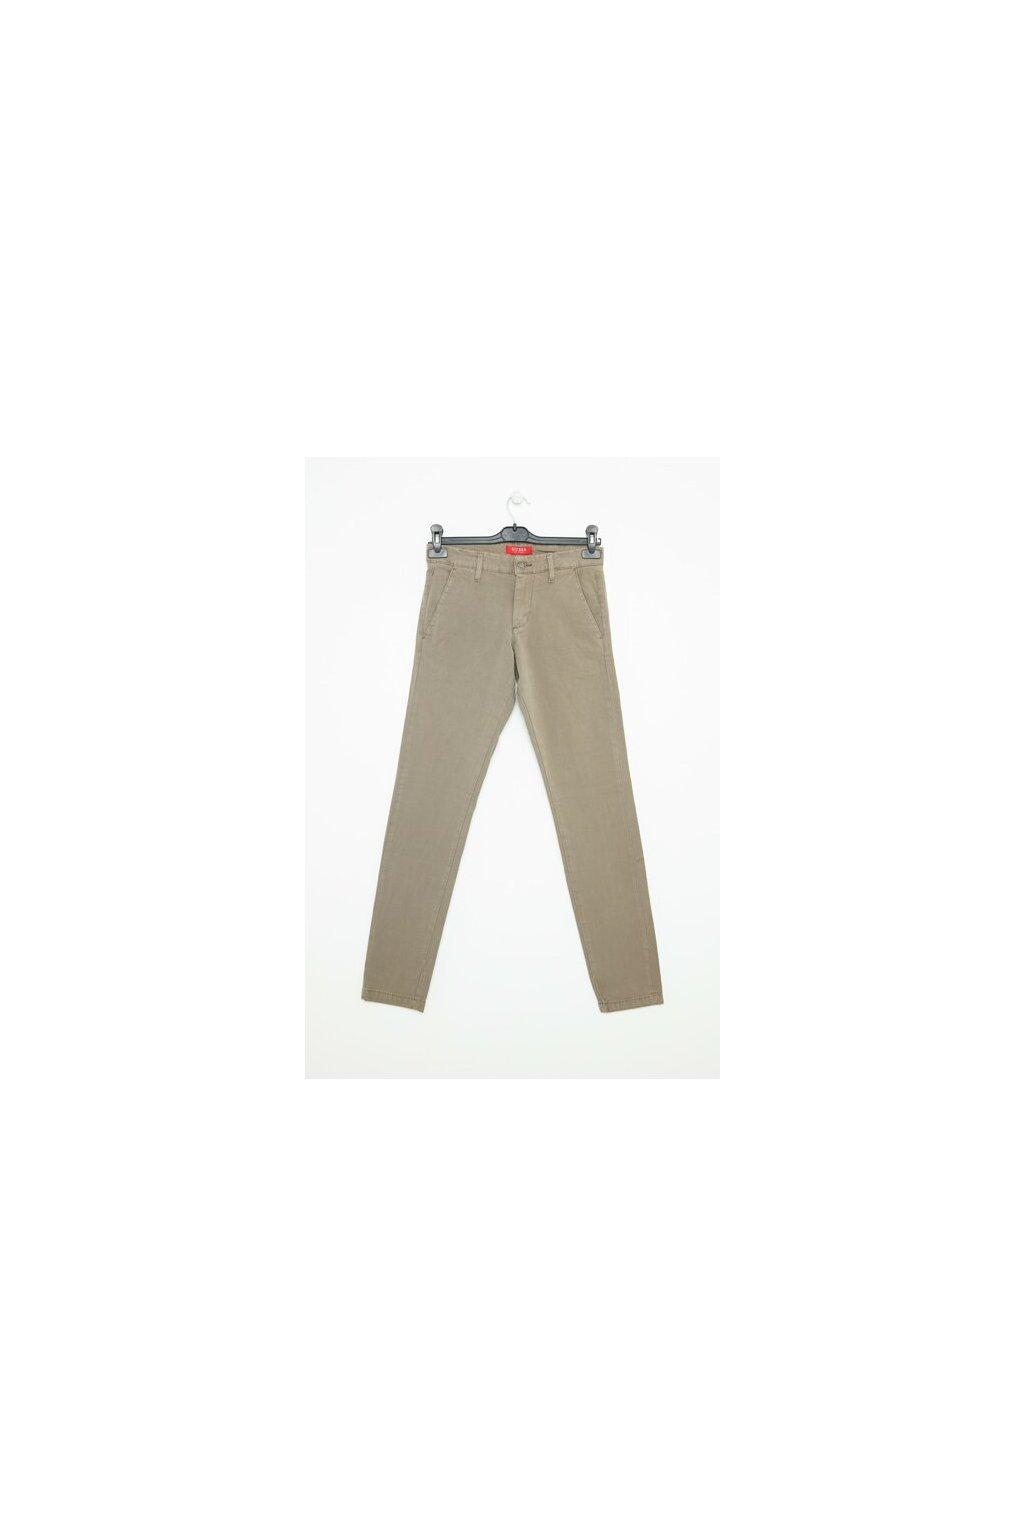 Pánské Guess kalhoty M64B02WA299